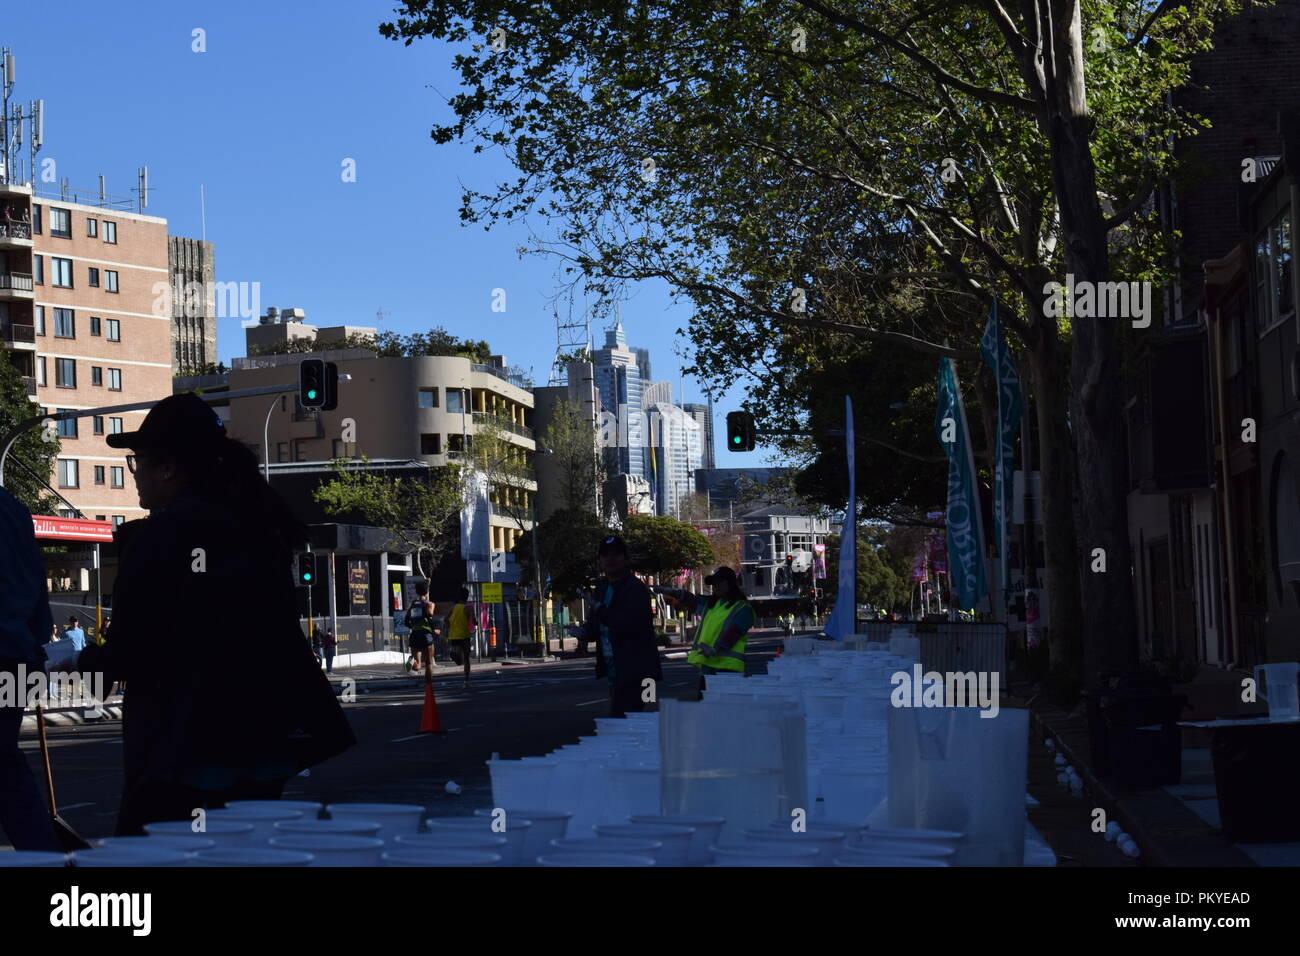 Sydney Running Festival - 2018 - Stock Image